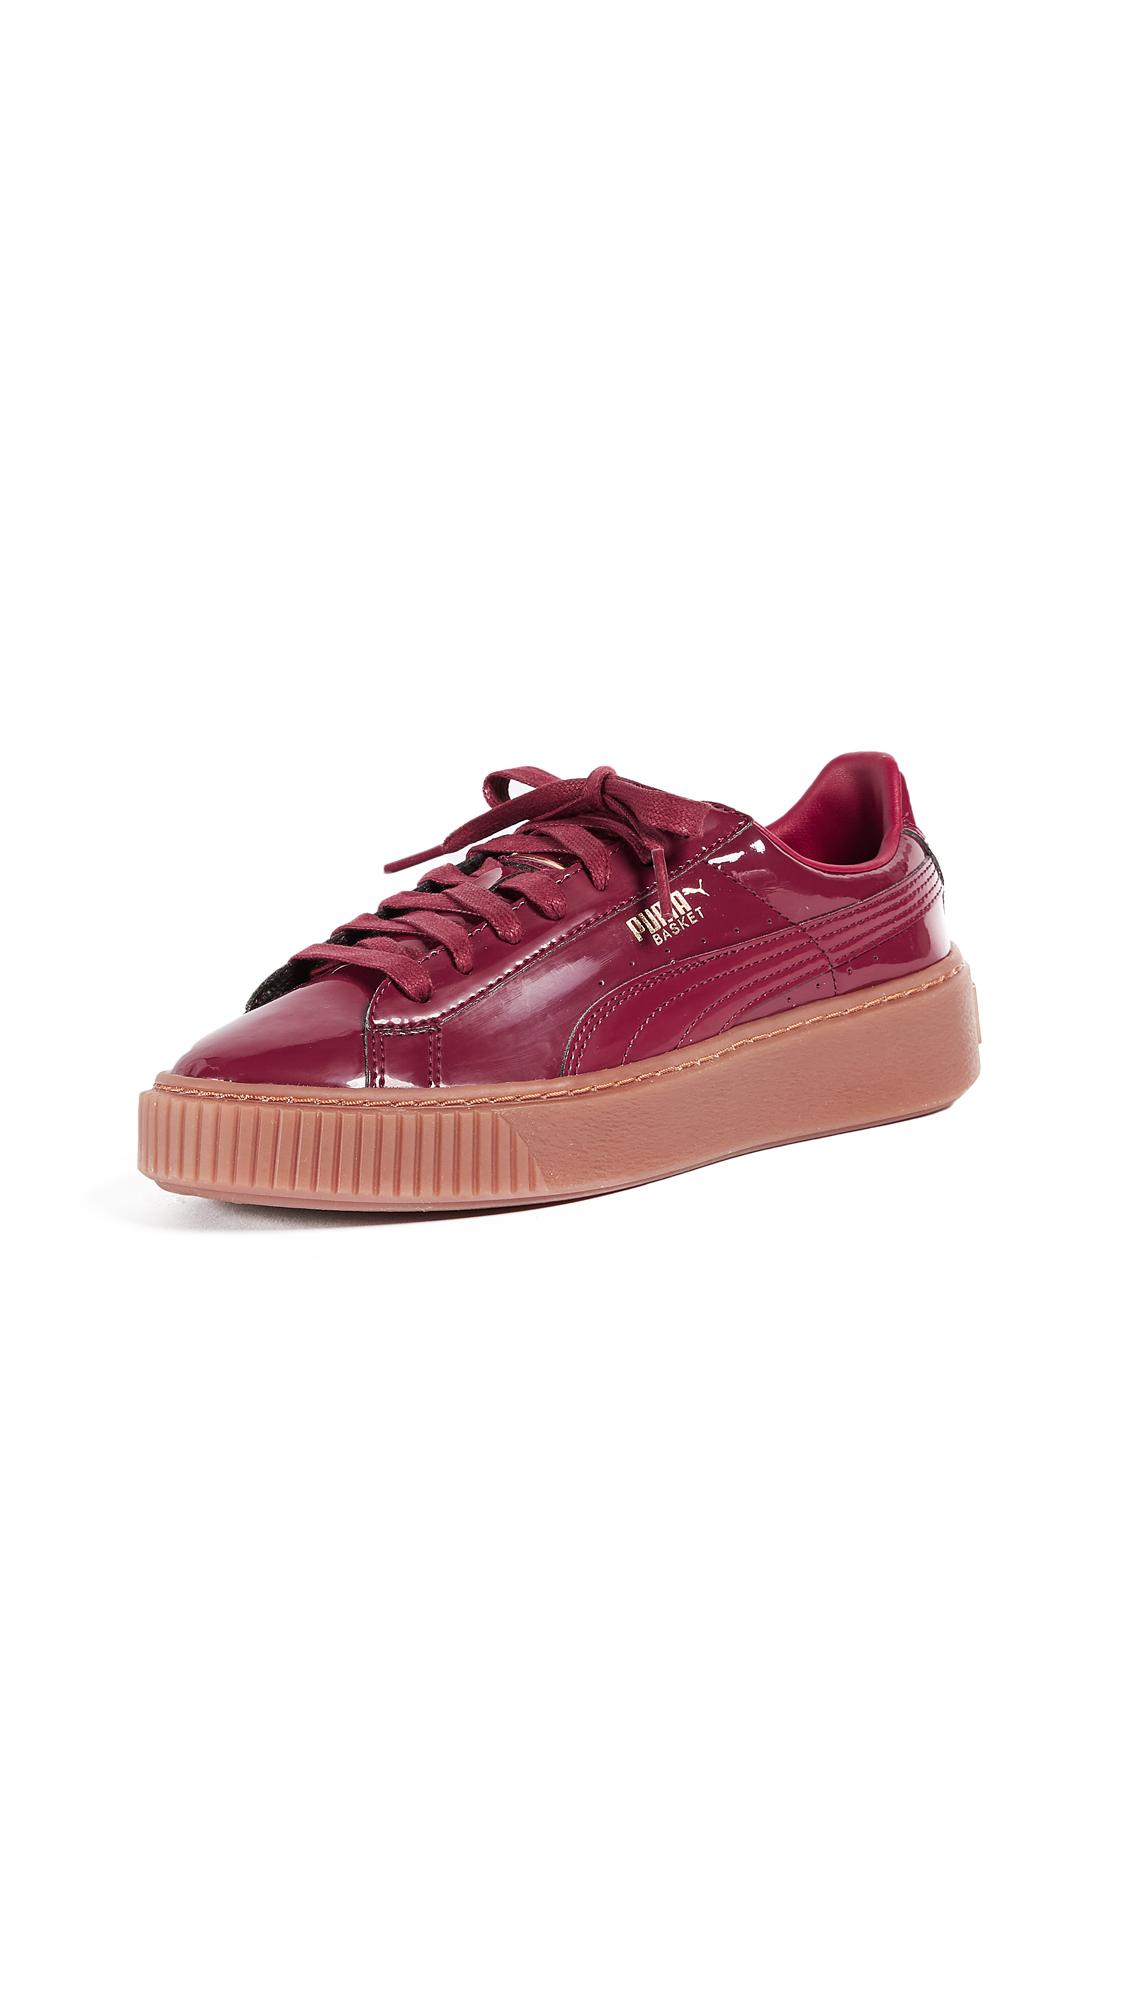 PUMA Basket Platform Patent Sneakers - Burgundy